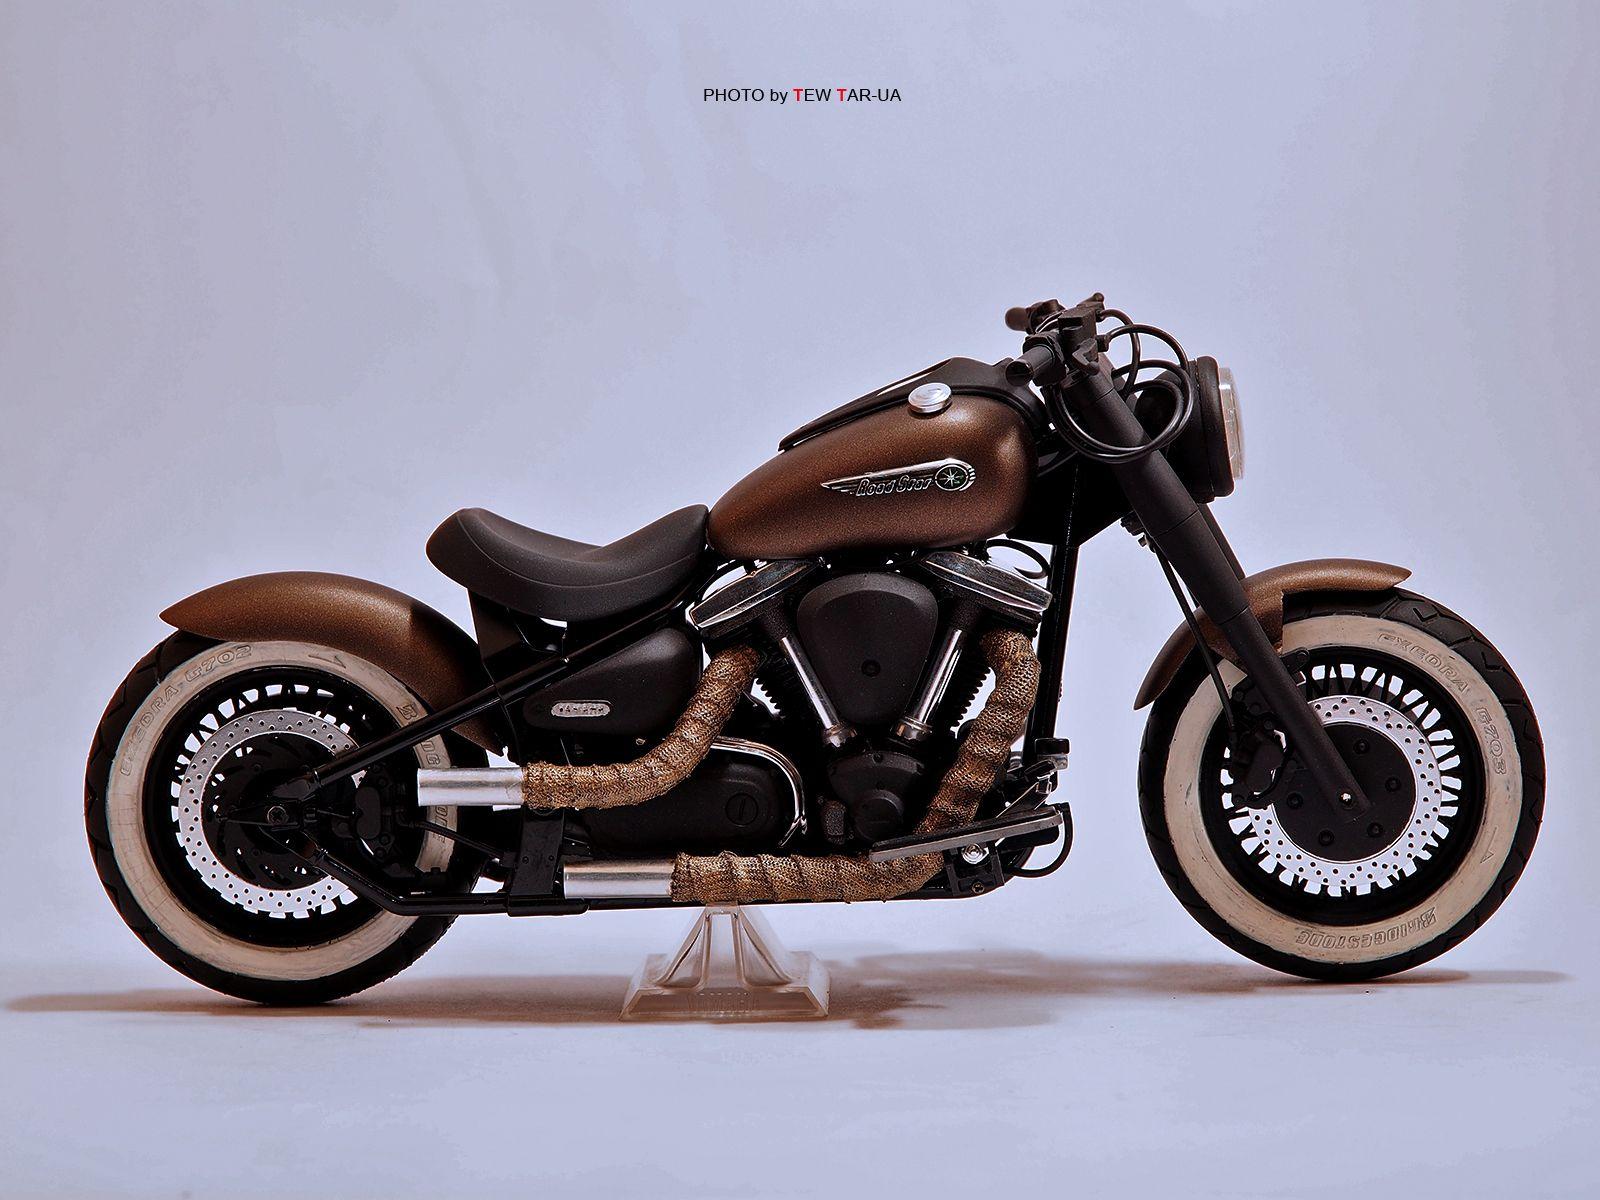 1999 YAMAHA XV1600 Roadstar Bobber Bobbers, Yamaha, Motorbikes, Biker,  Motorcycles, Motorcycle